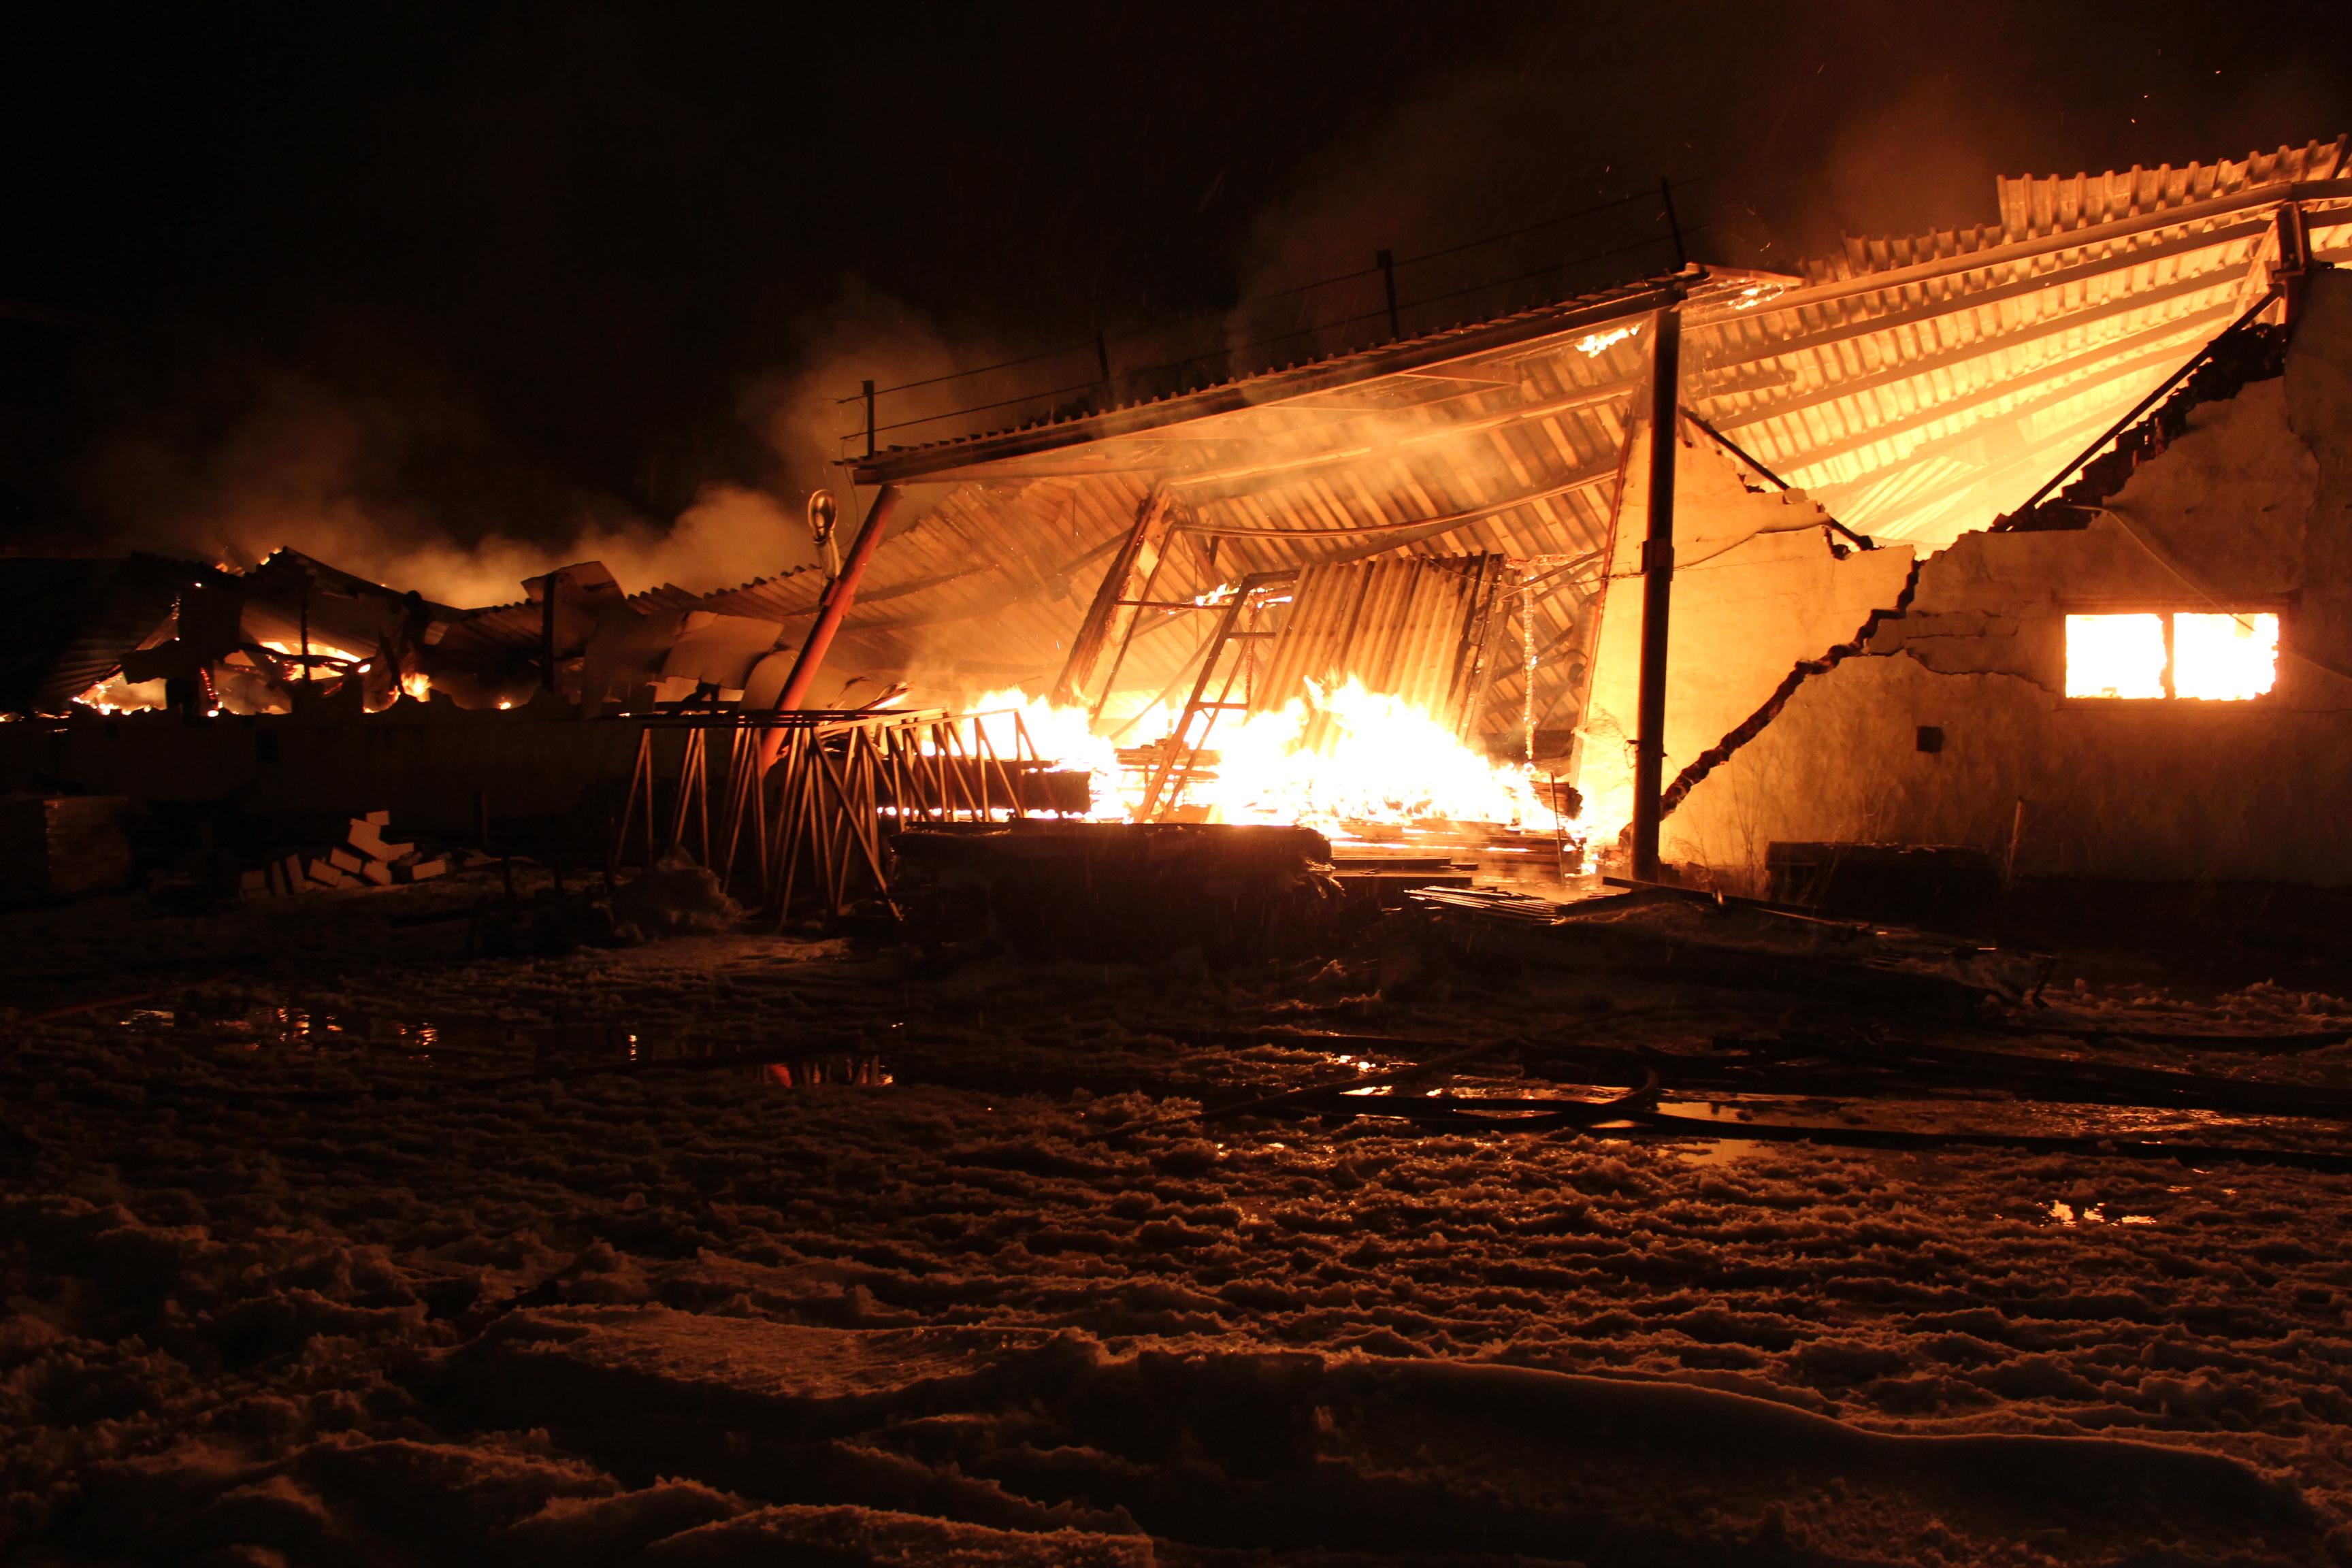 Склад в Вологде загорелся из-за станка